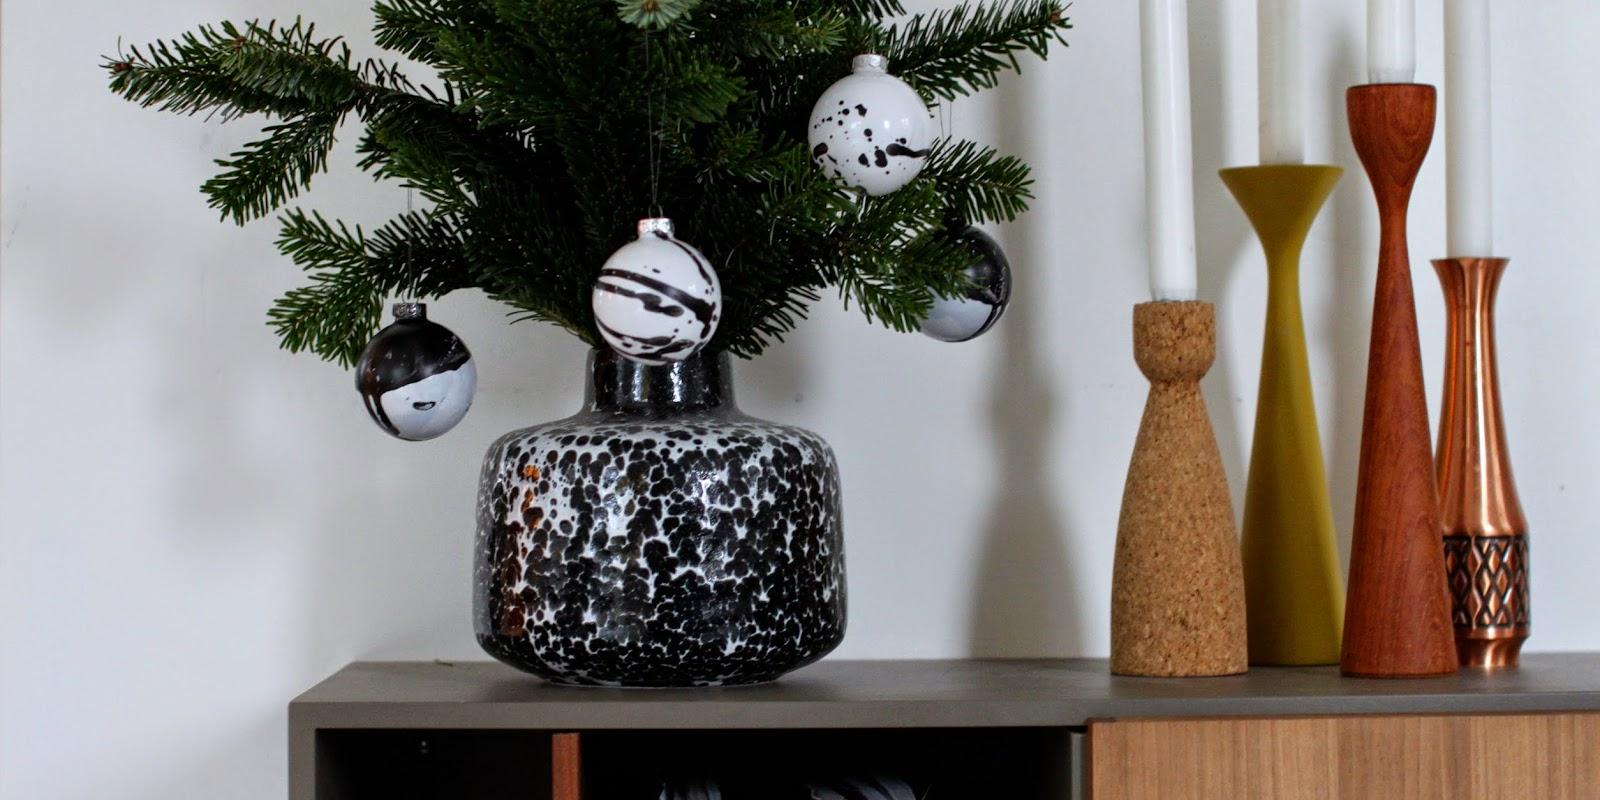 Julekugler sort/hvid